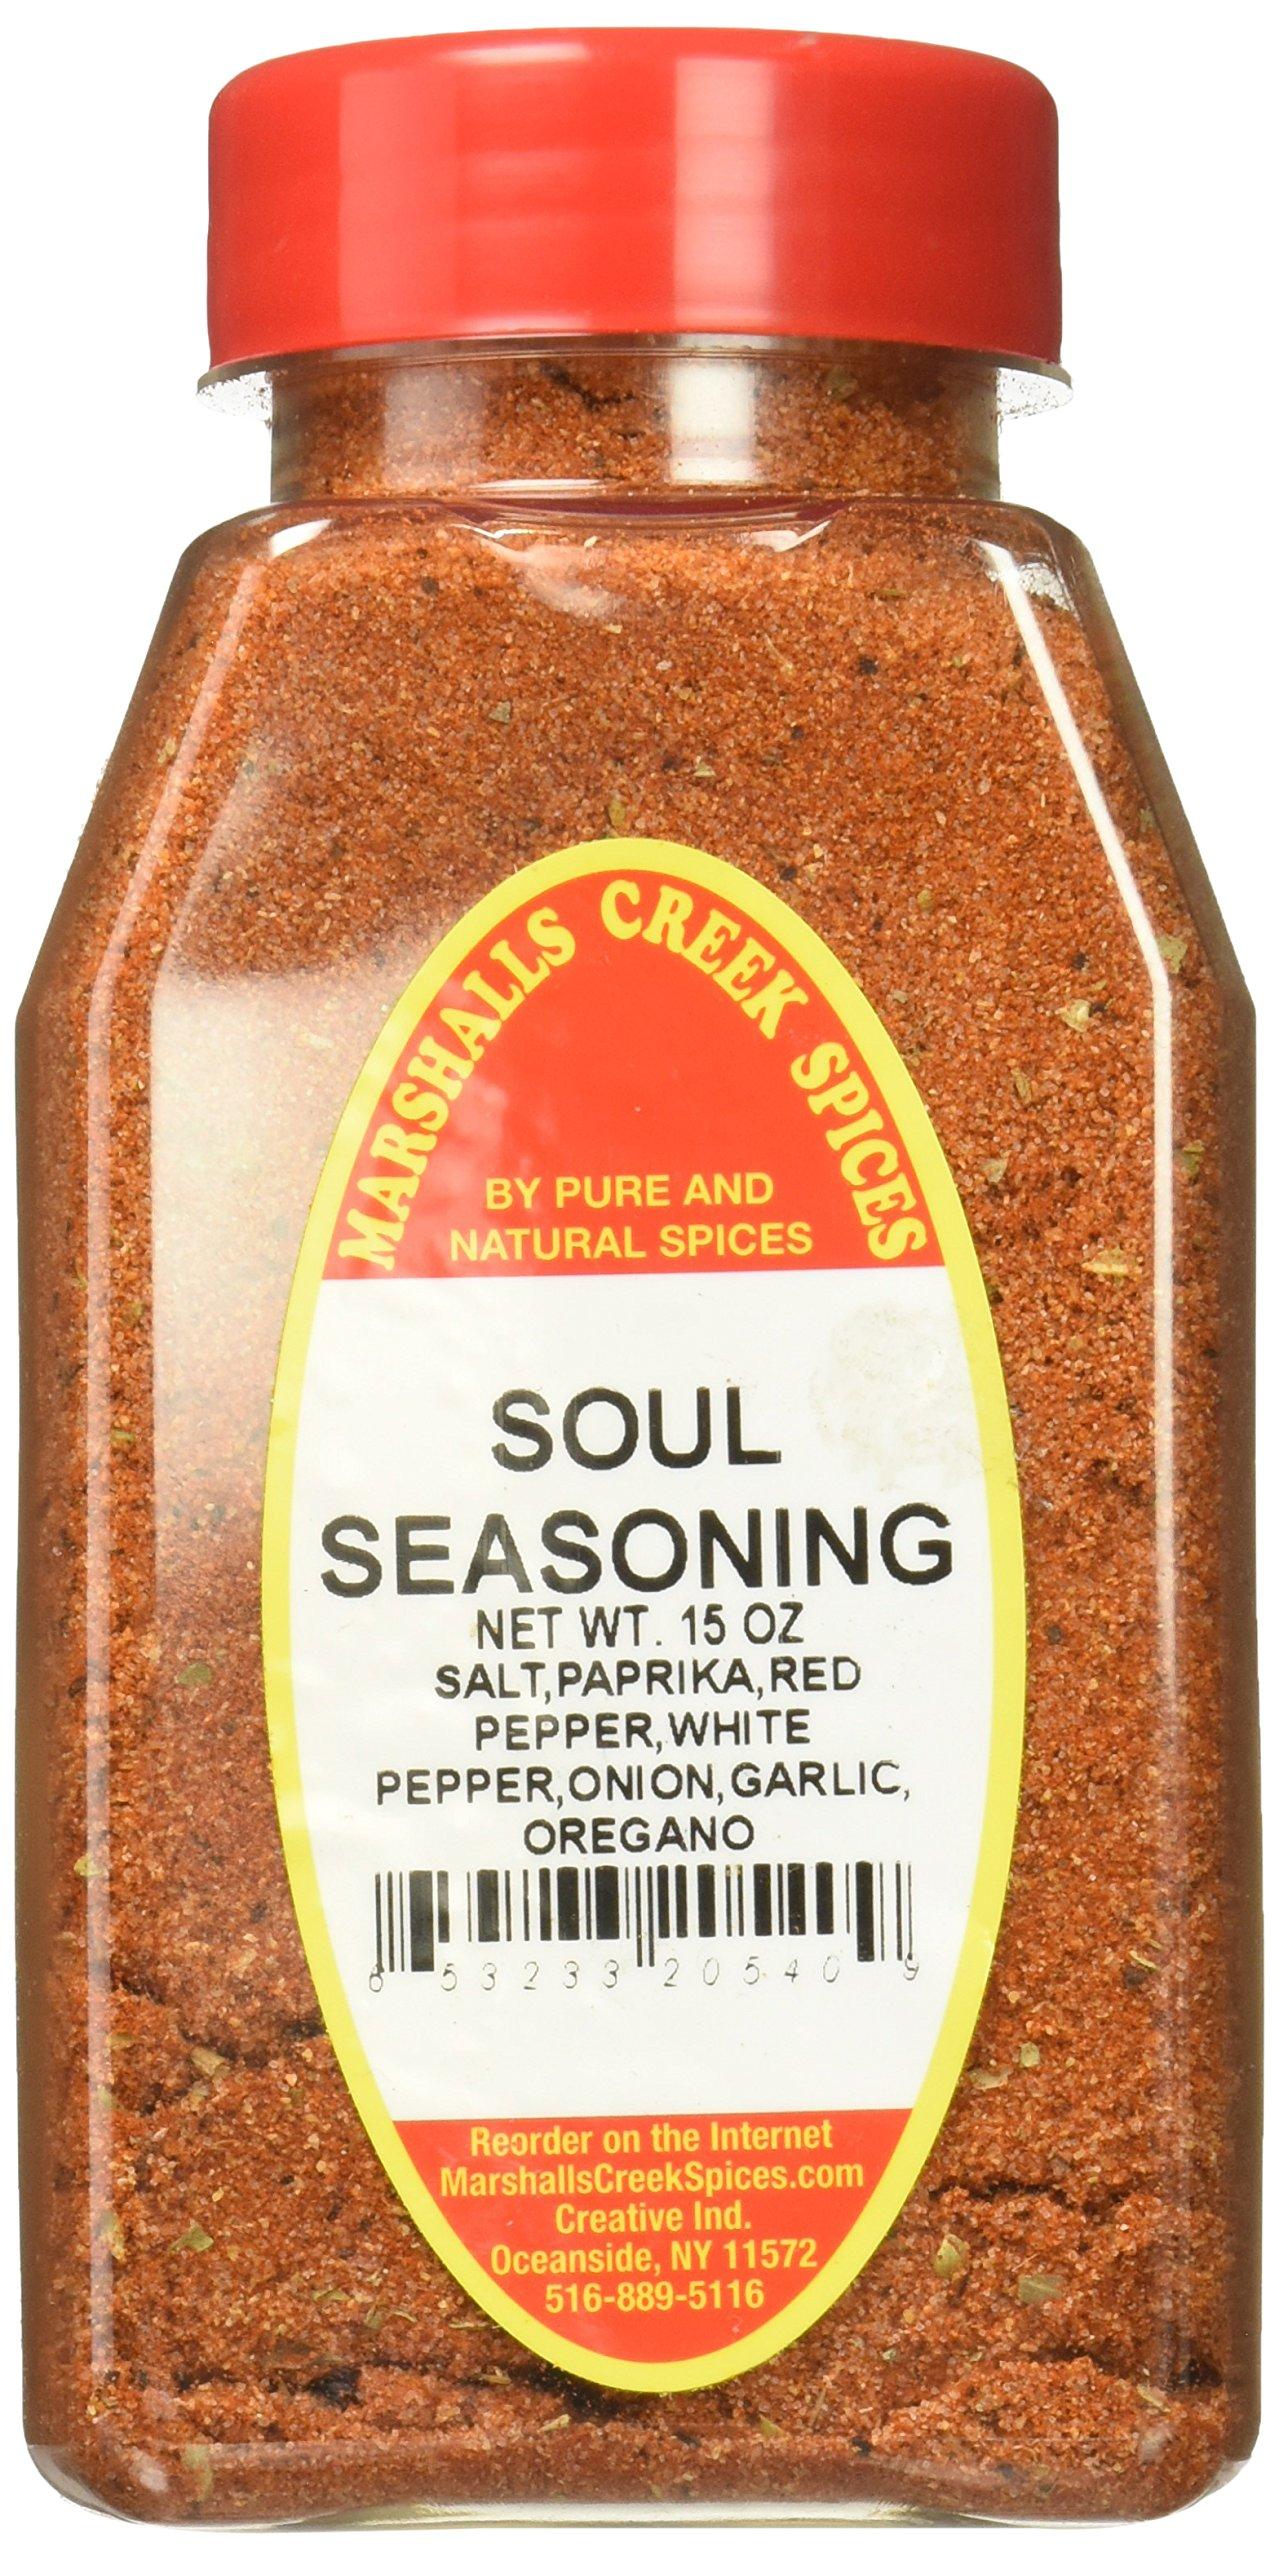 Marshalls Creek Kosher Spices SOUL SEASONING 15 oz